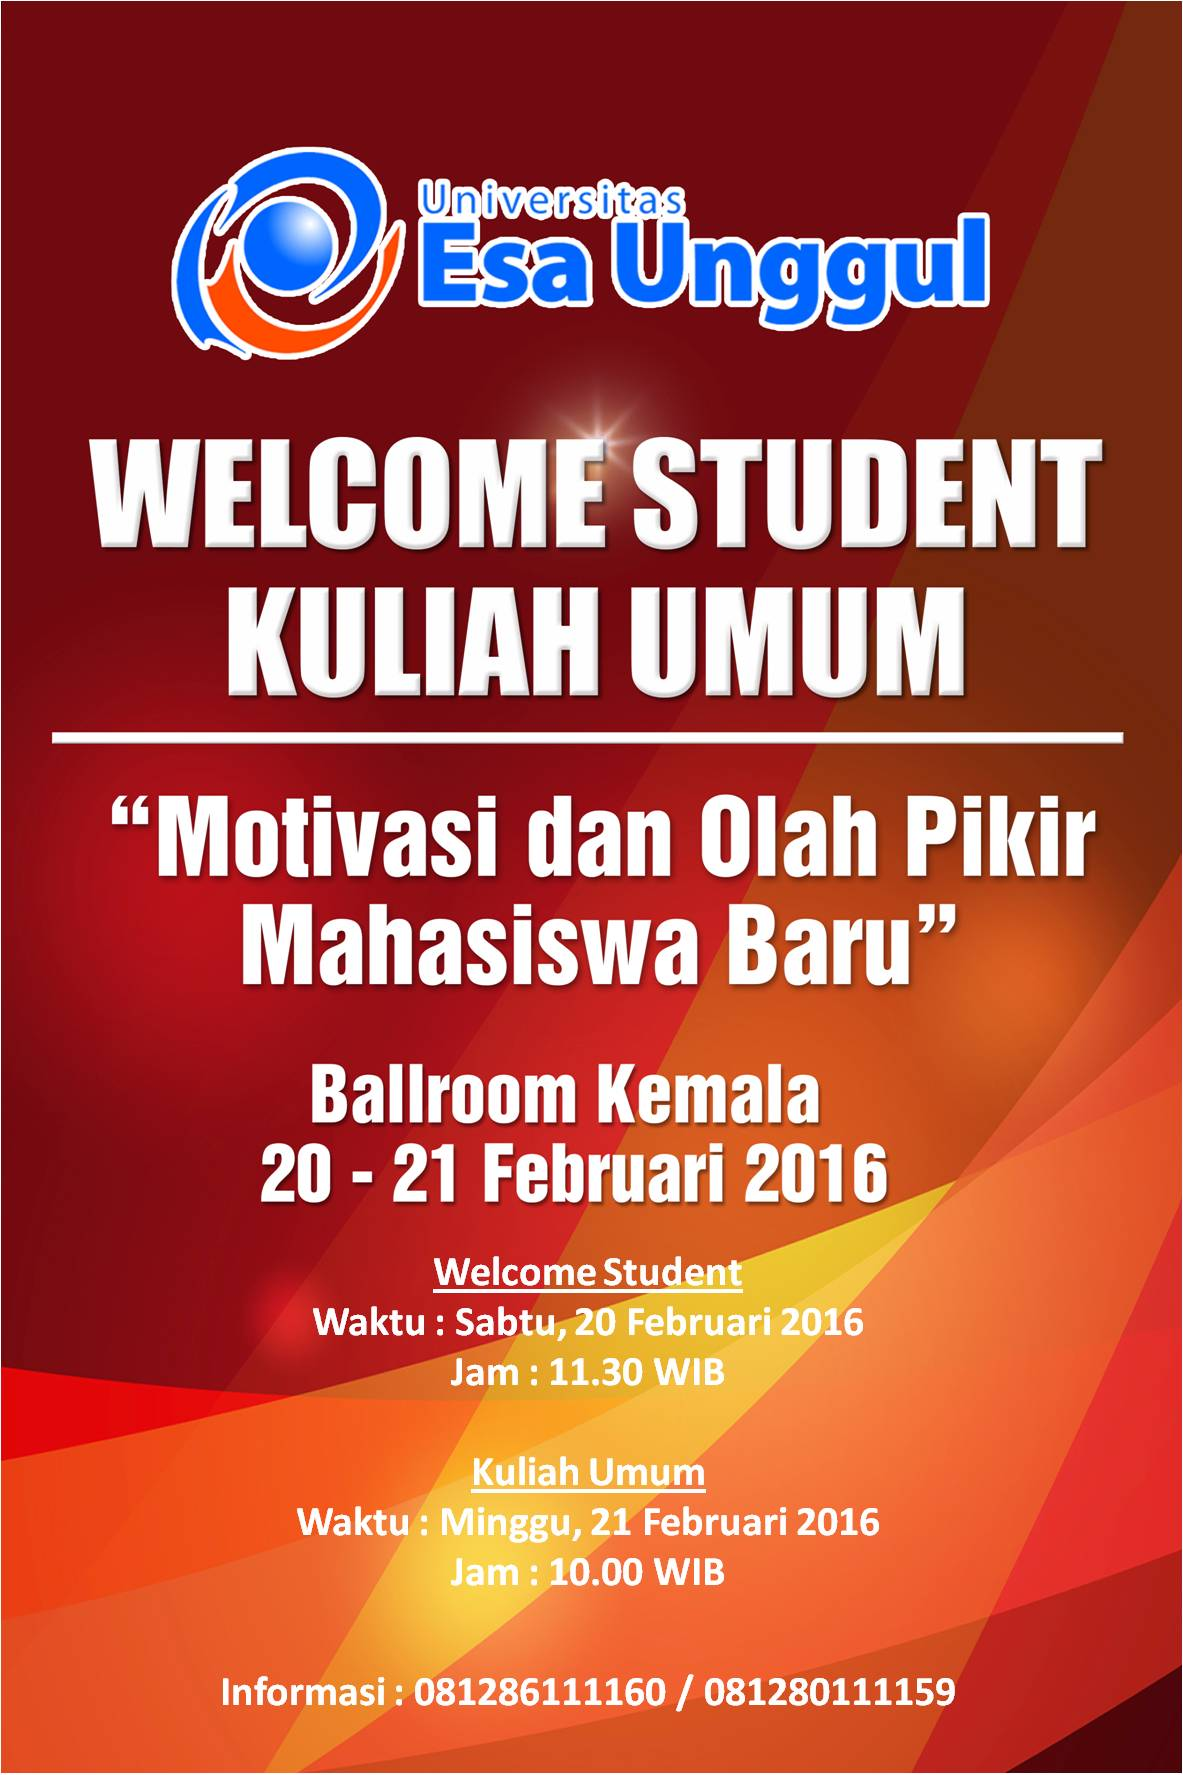 Welcome Student Universitas Esa Unggul  Kelas Paralel Semester Genap 2015/2016